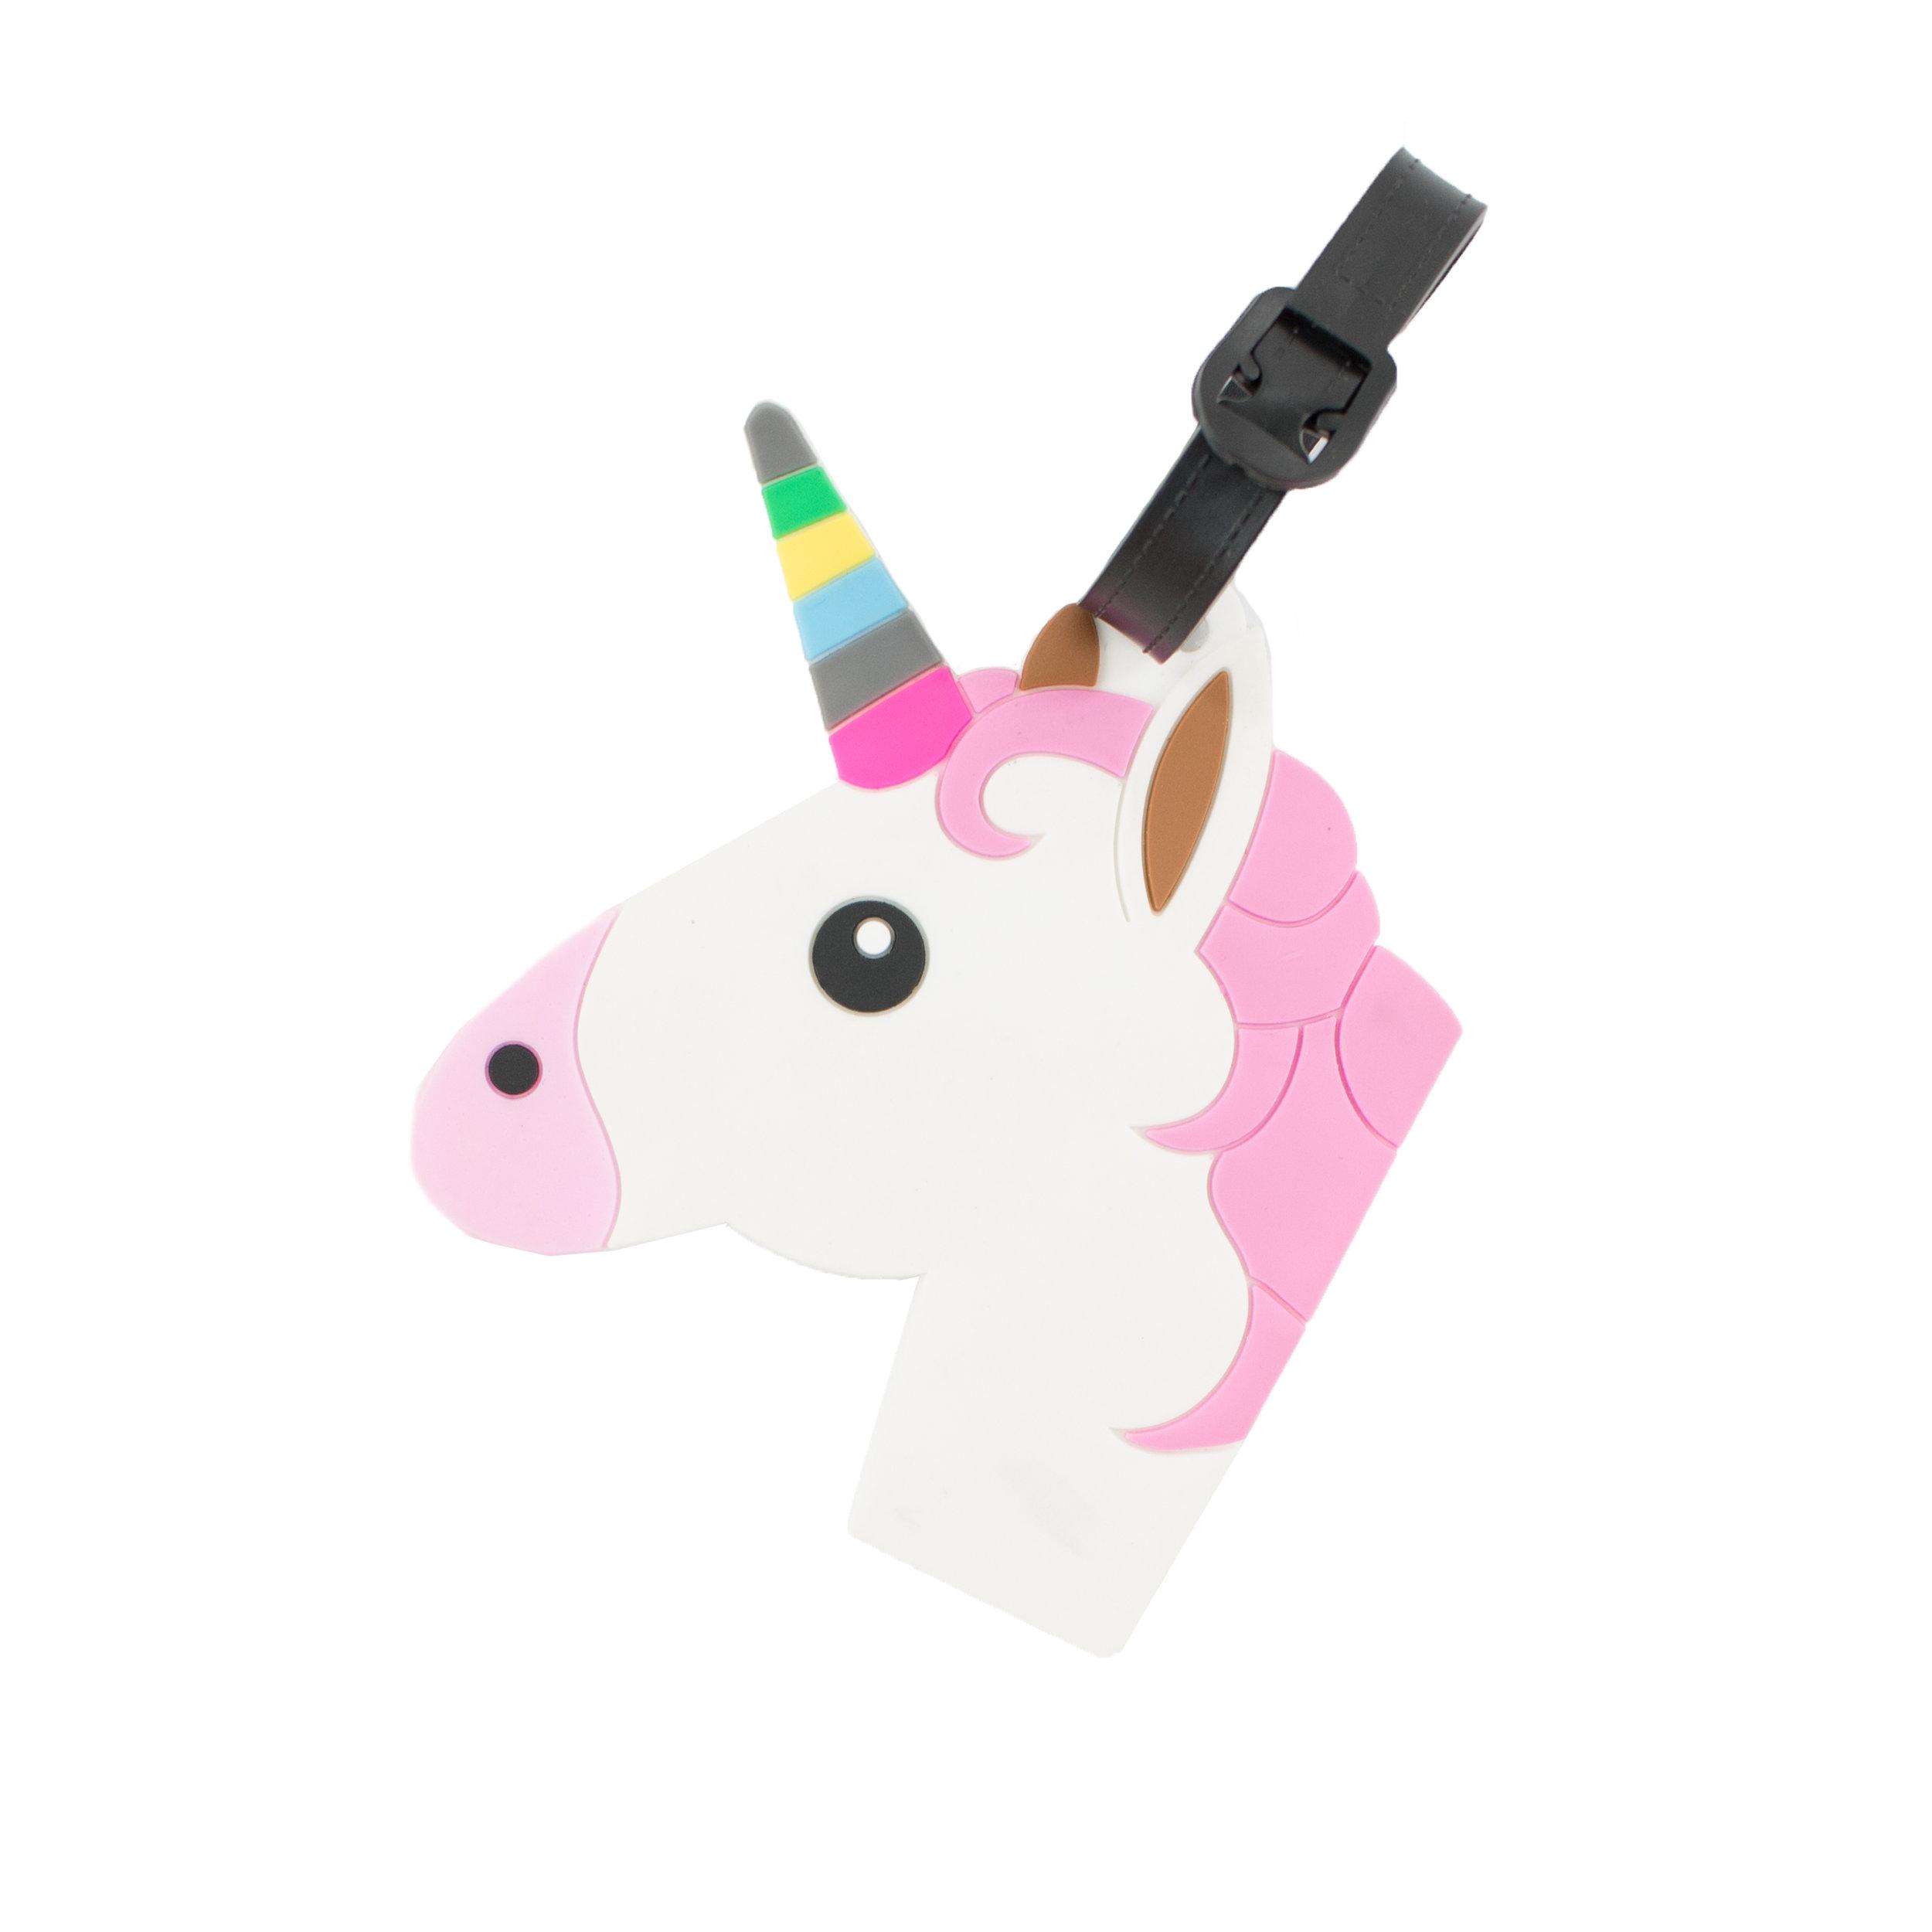 Unicorn_ID_3000.jpg